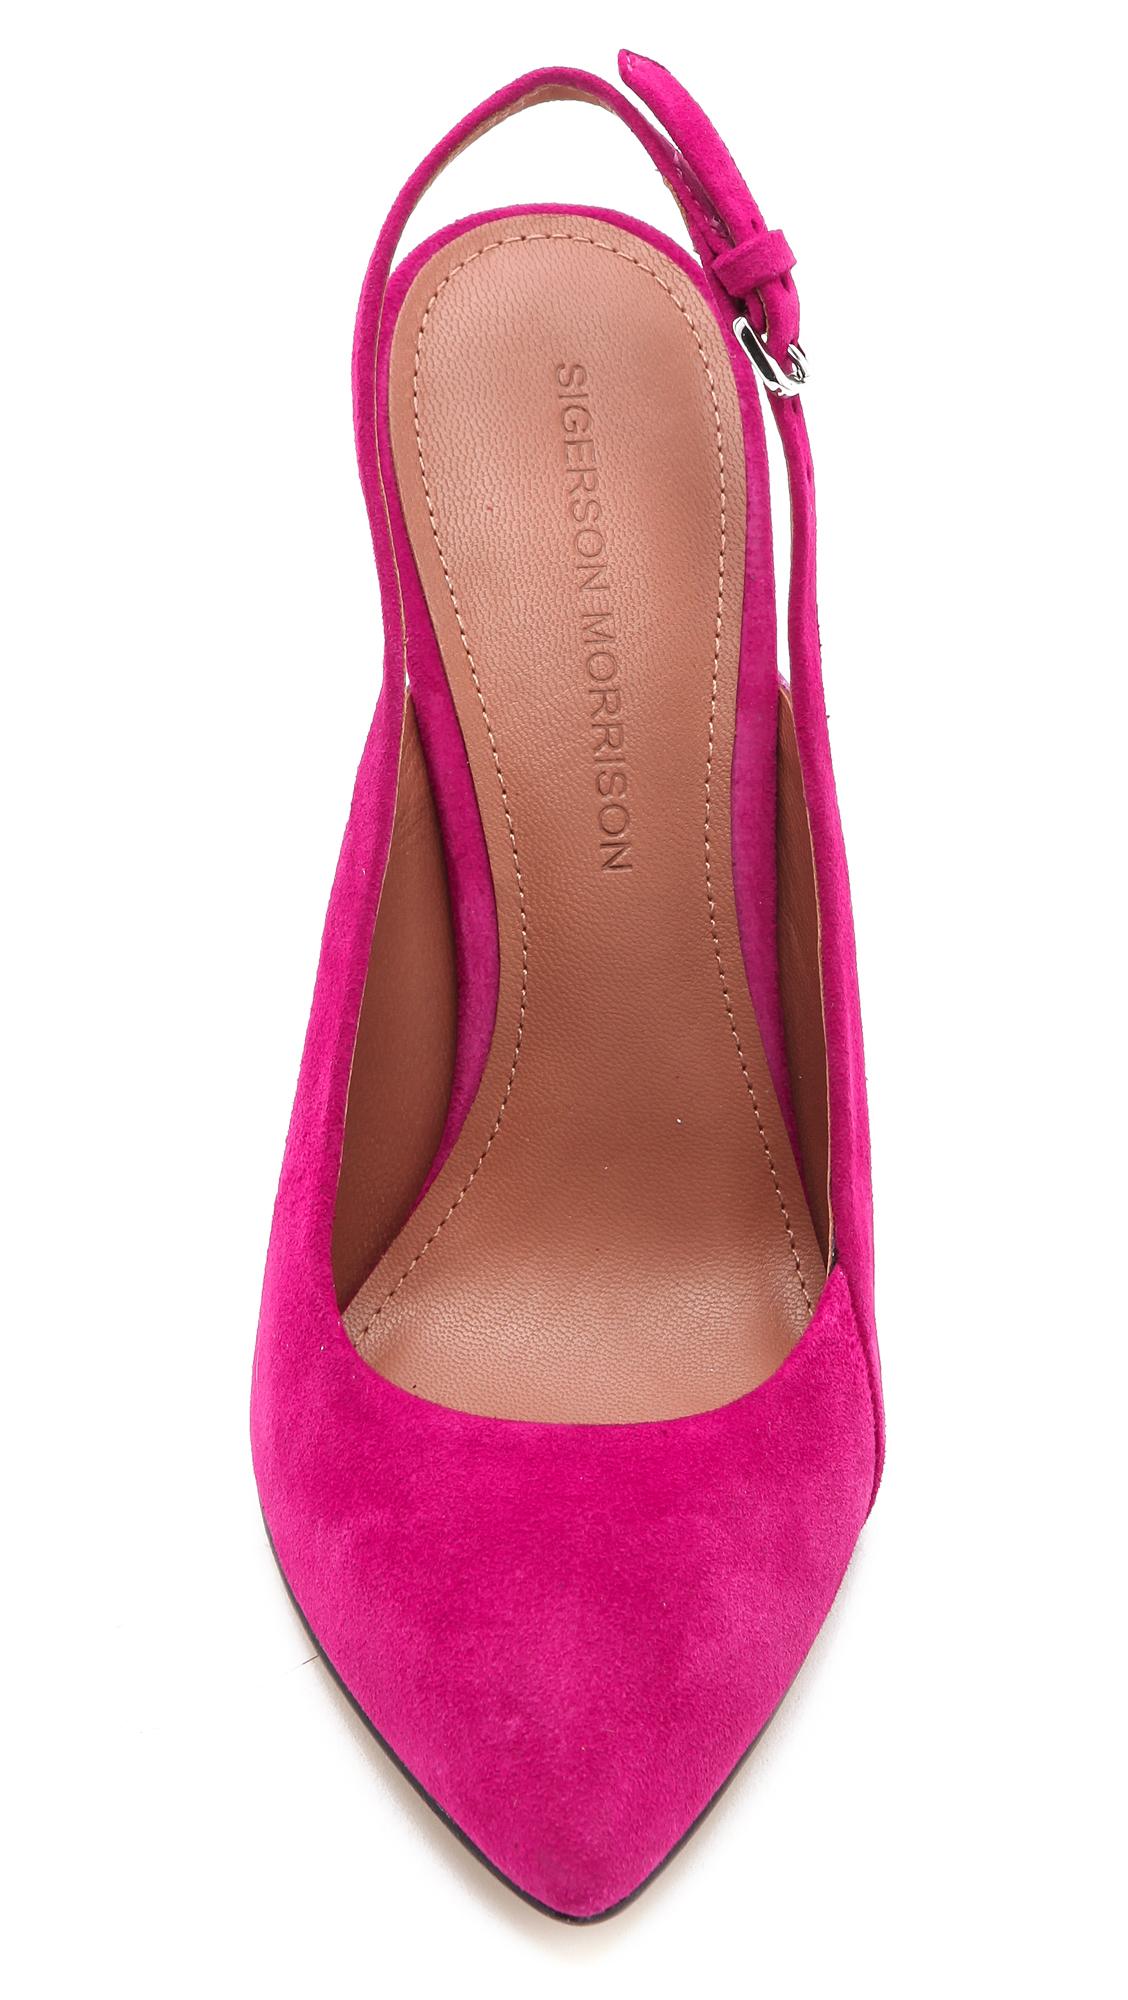 Sigerson morrison Slingback High Heels in Pink | Lyst